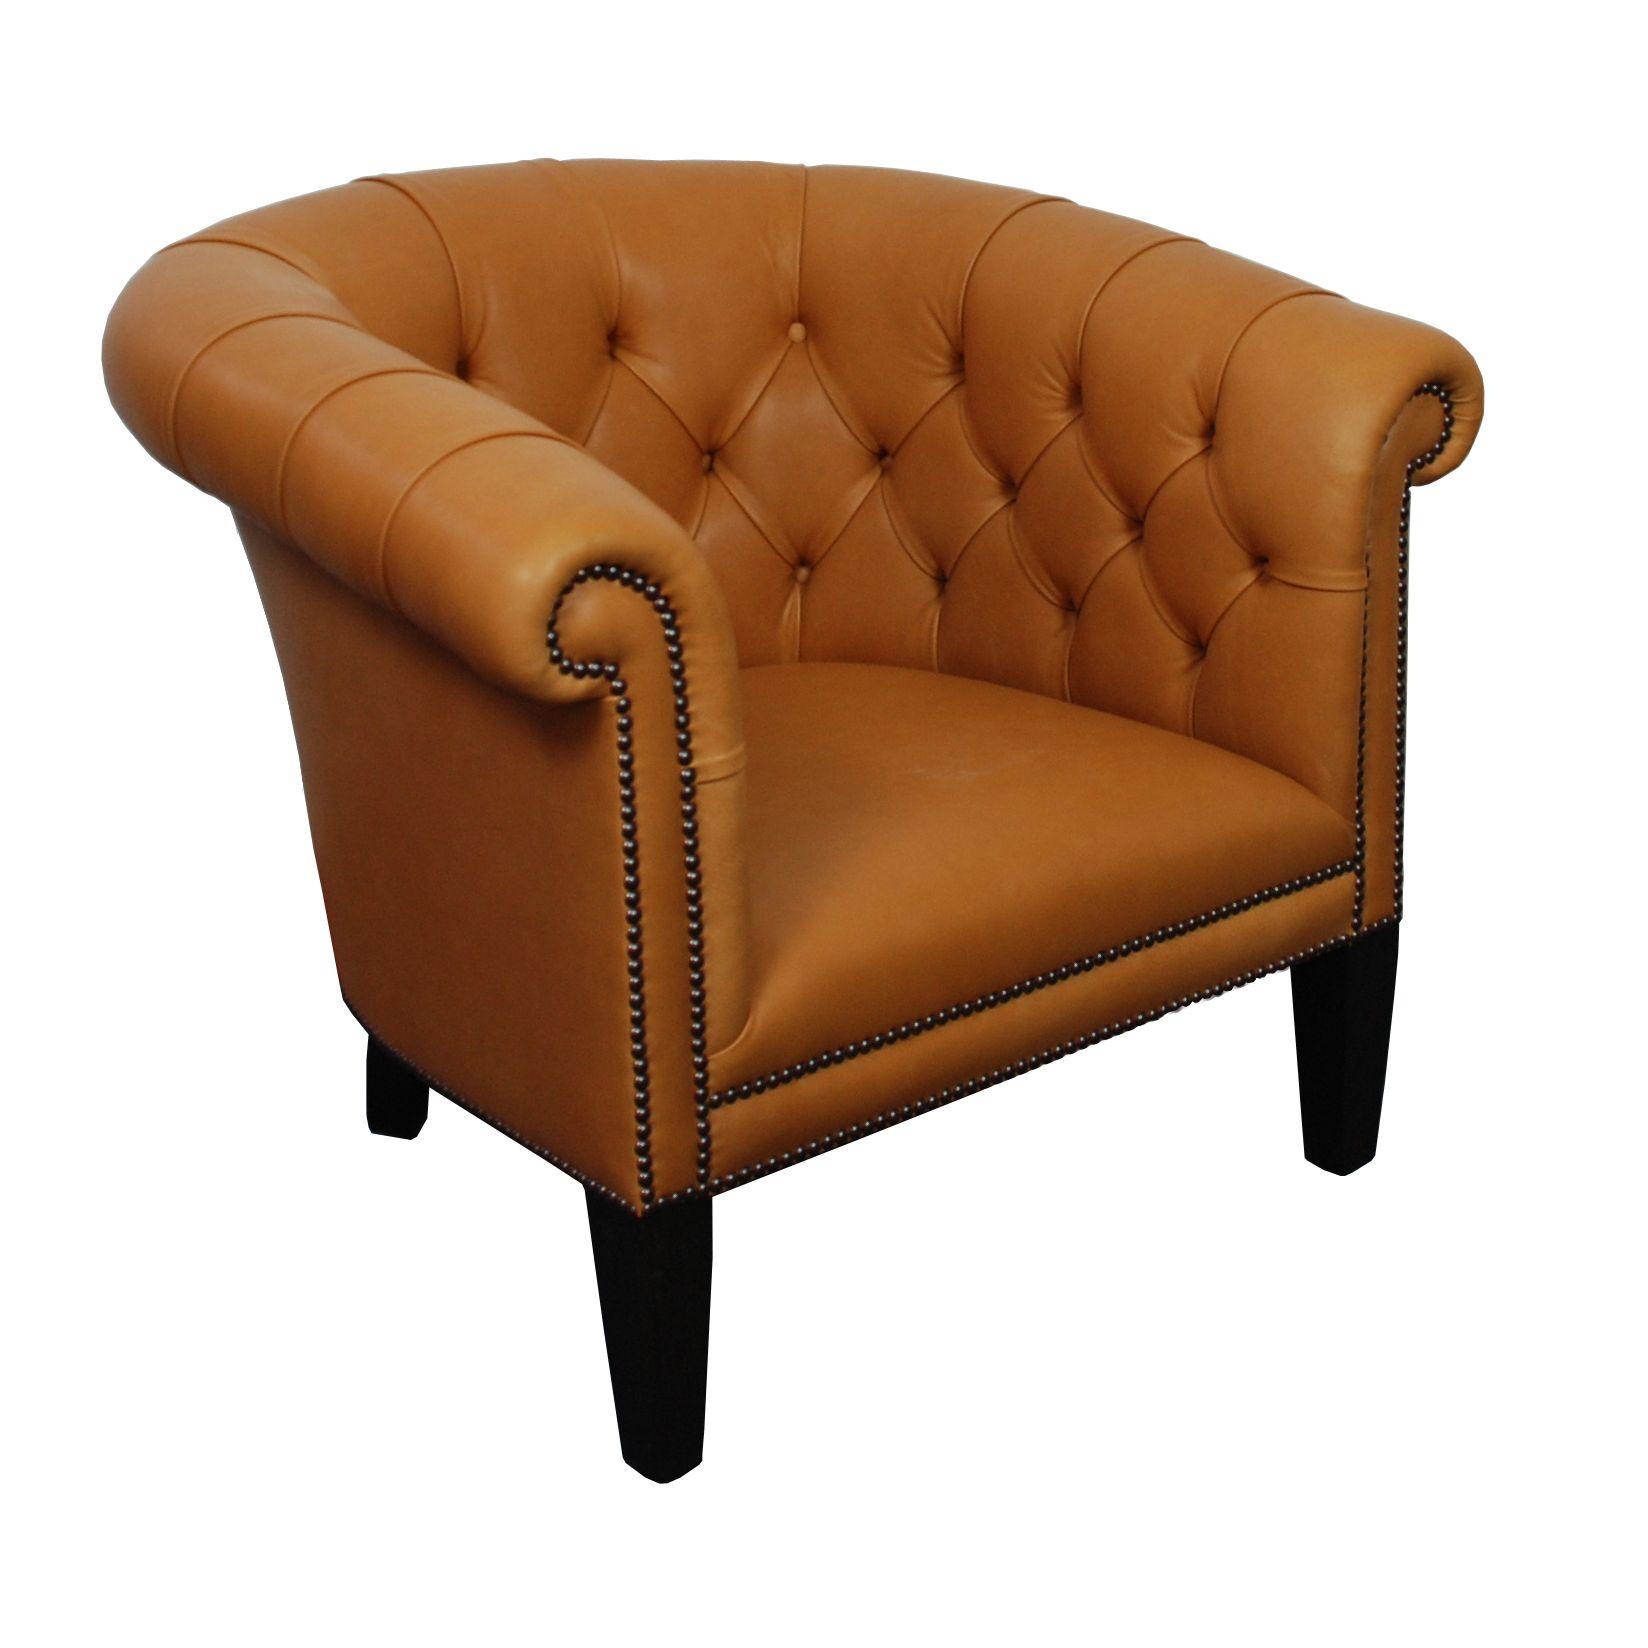 tub chairs furniture village   Minimalist Home Design   Pinterest ...